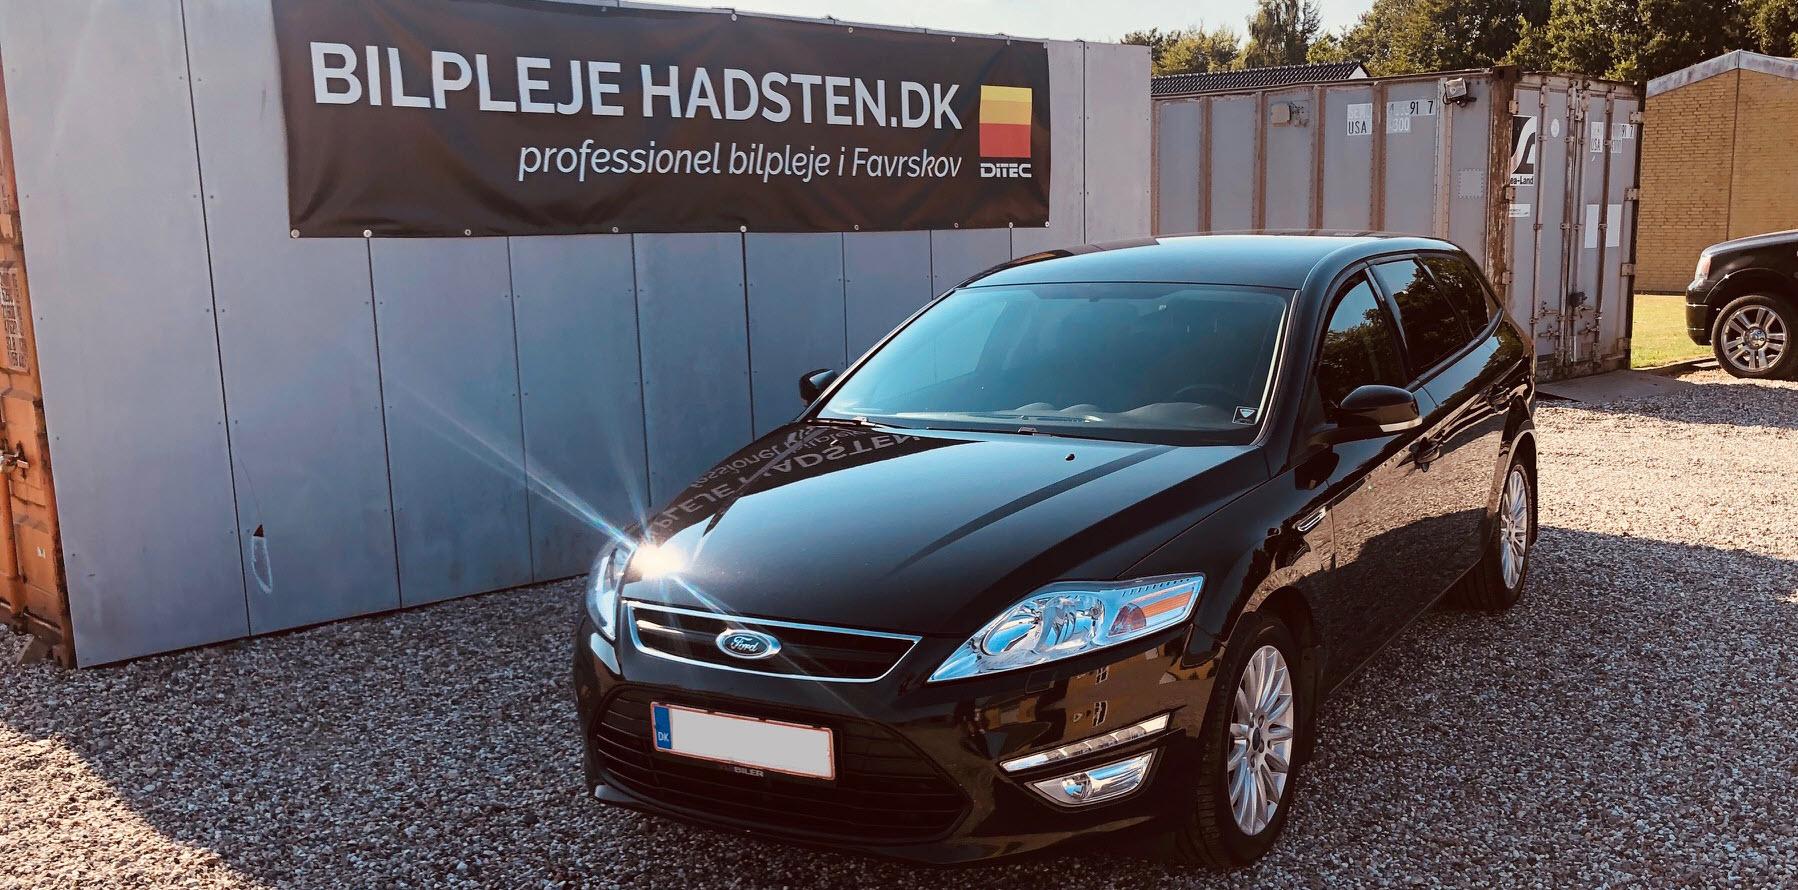 Ford Mondeo - Behandlet hos Bilpleje Hadsten